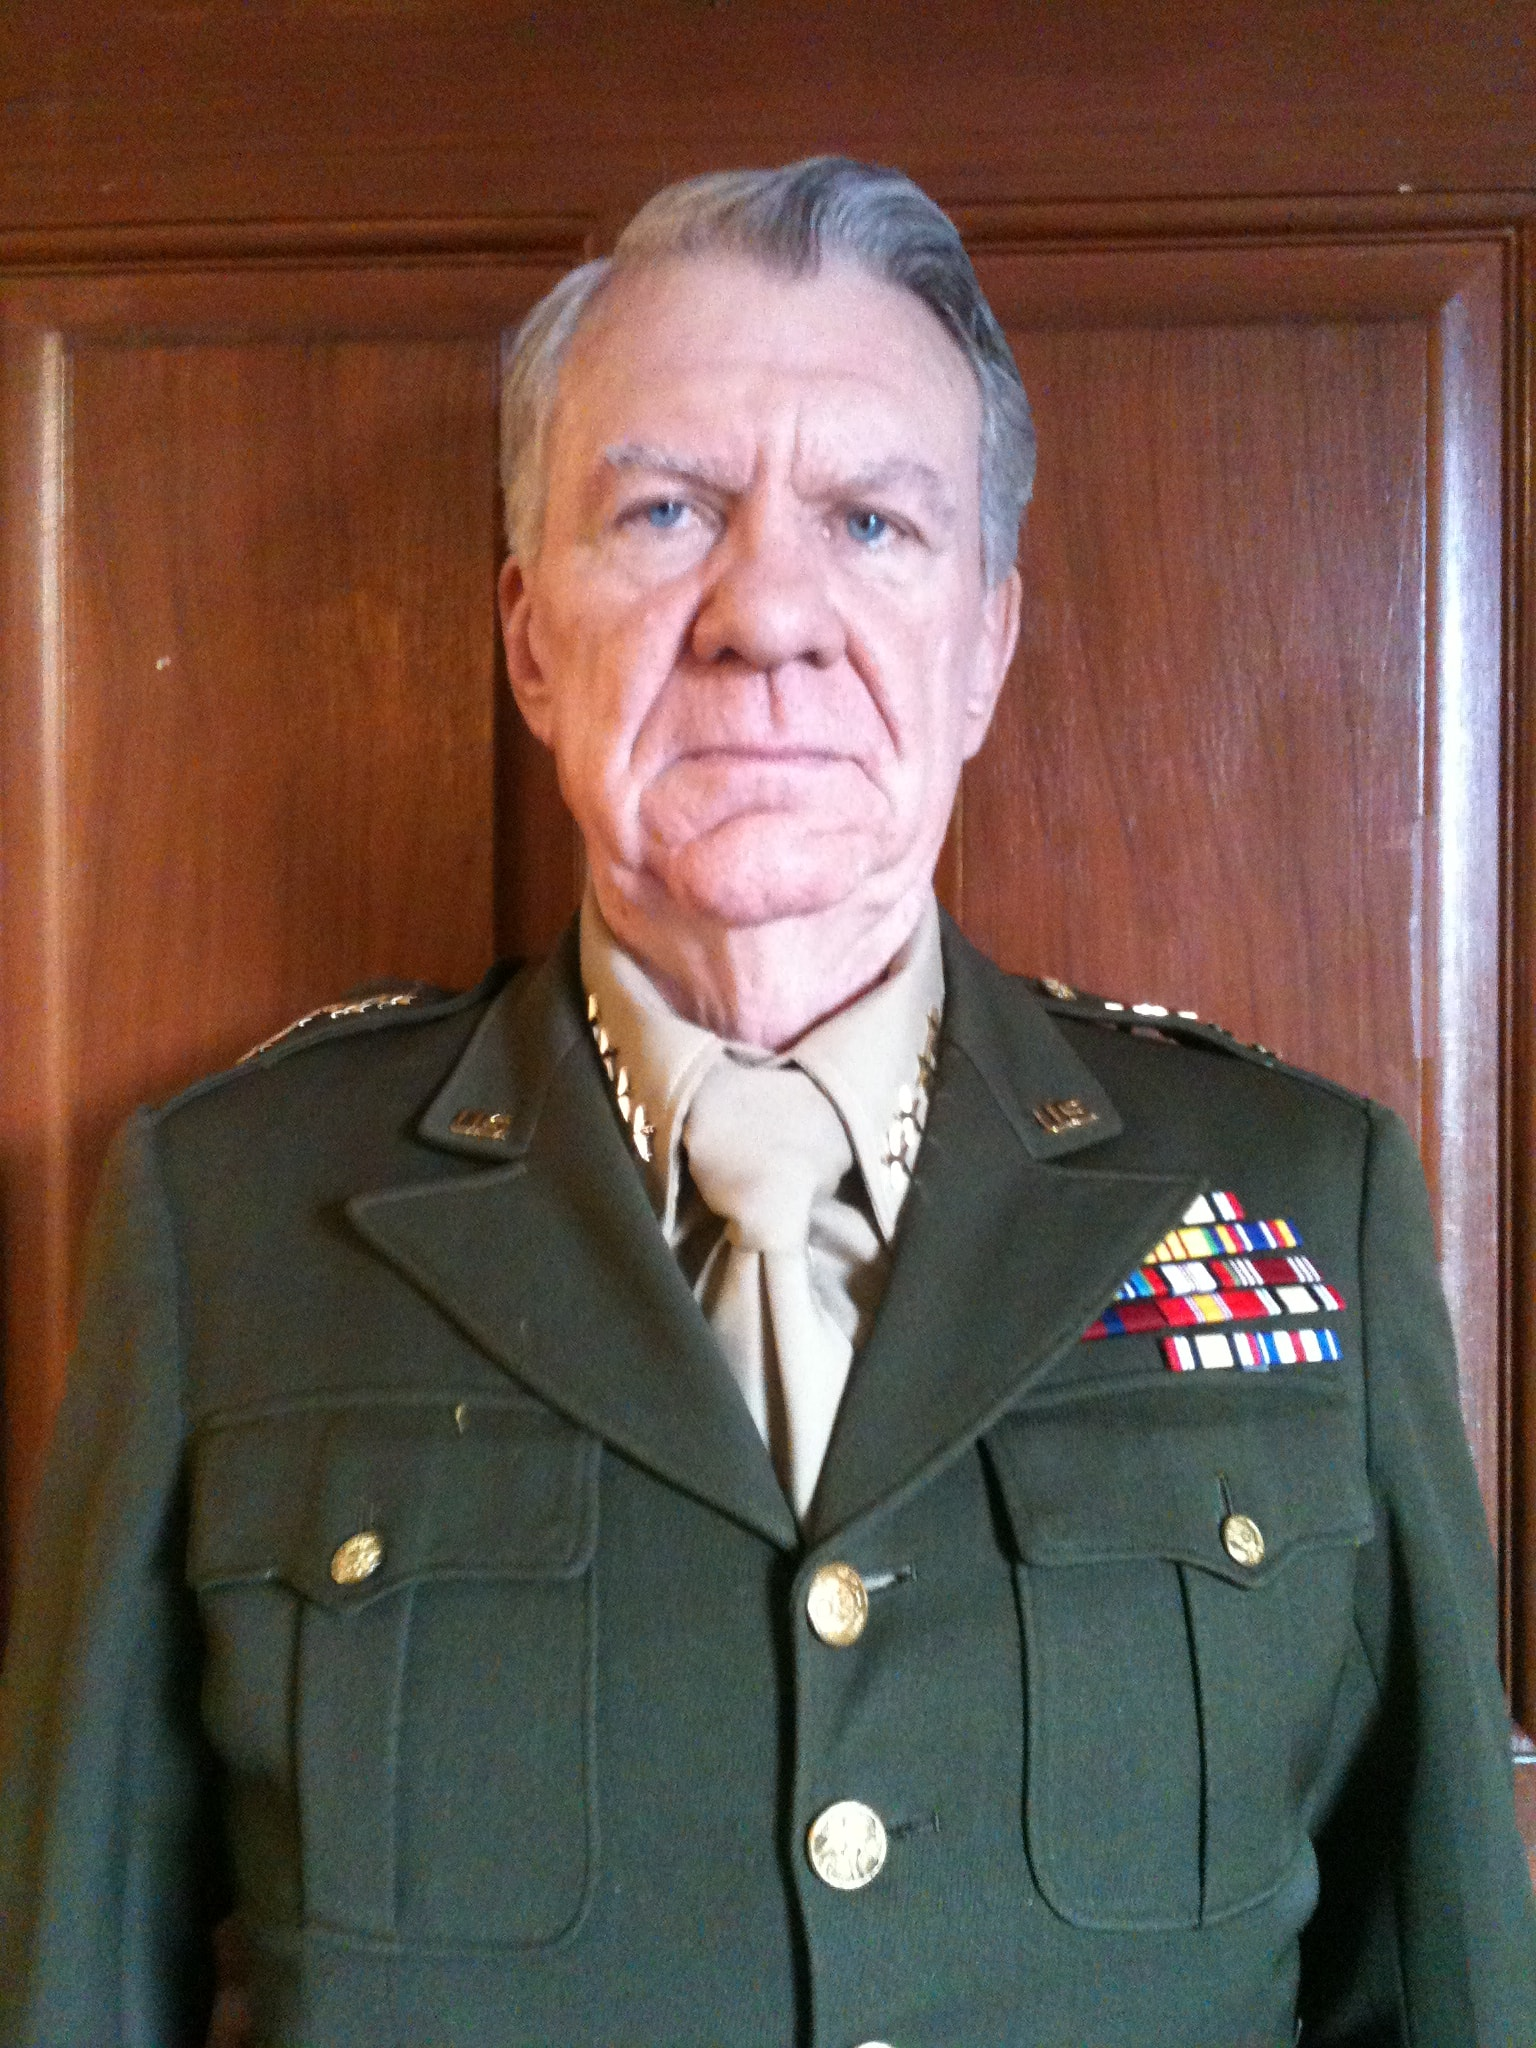 General Patton, David Olsen